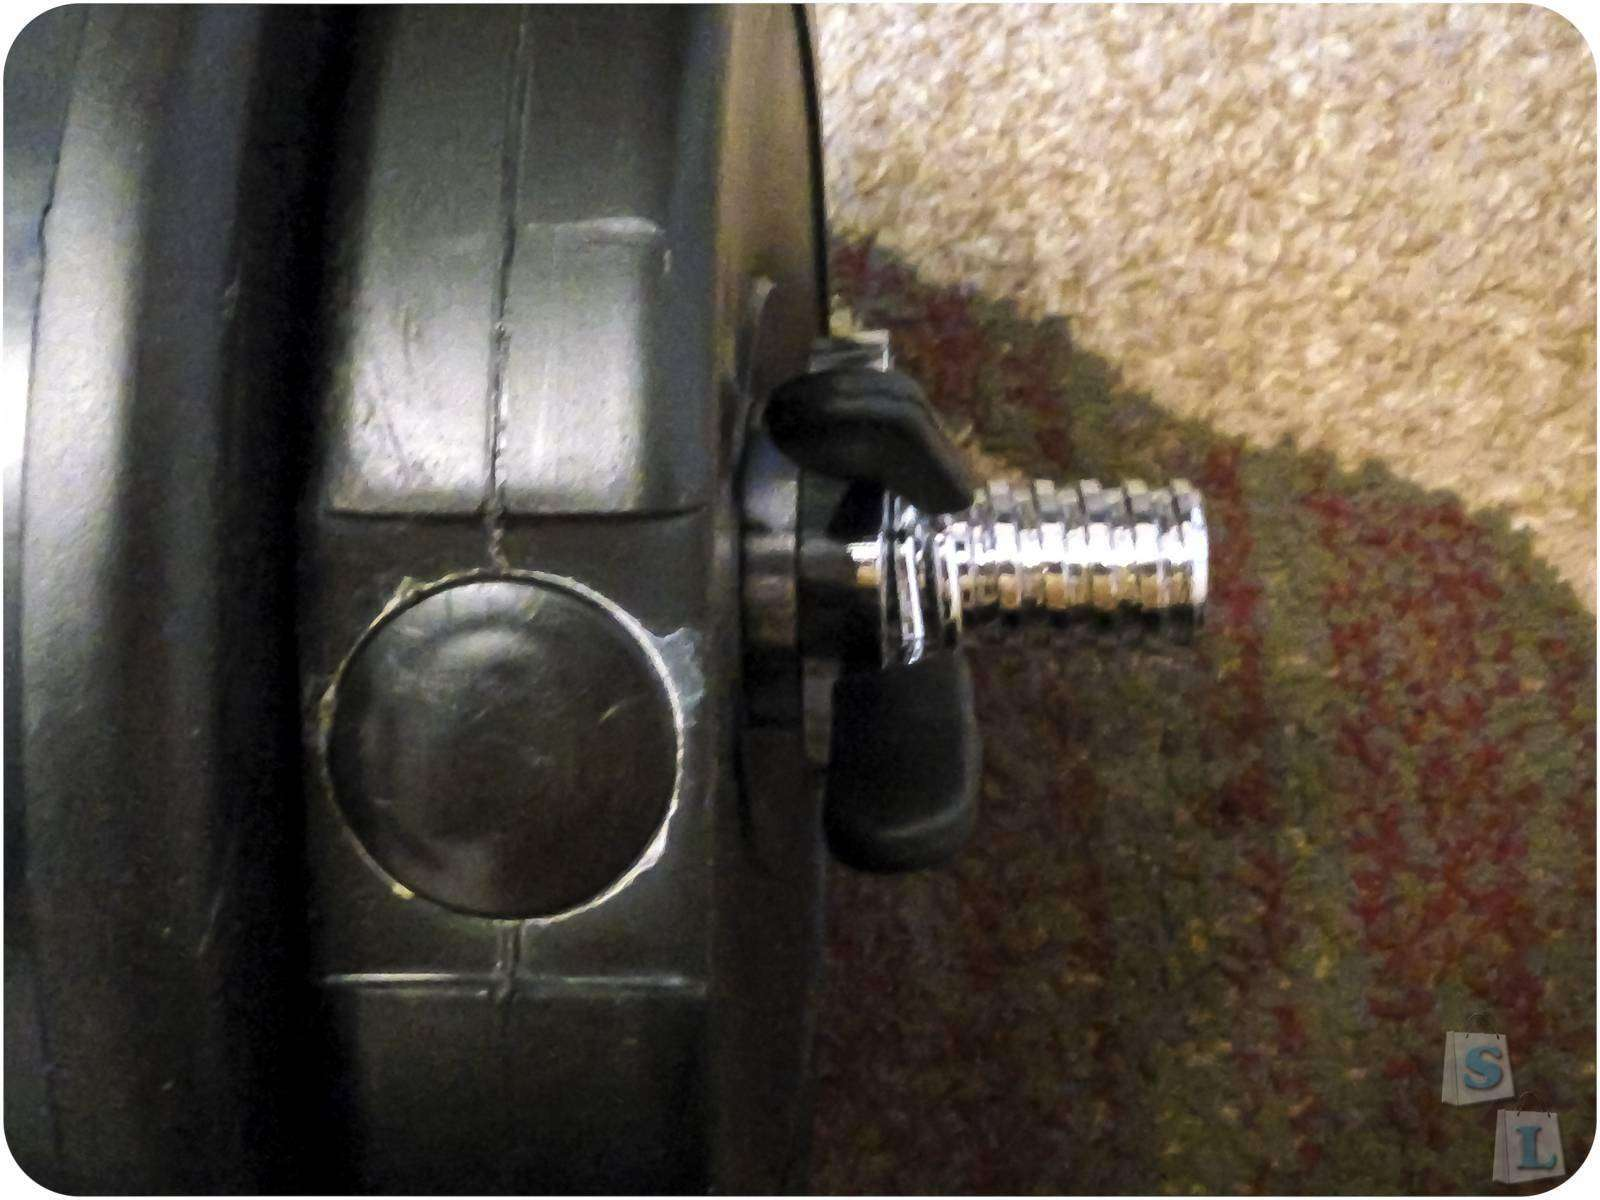 Aliexpress: Зажимы для грифа штанги D25 mm